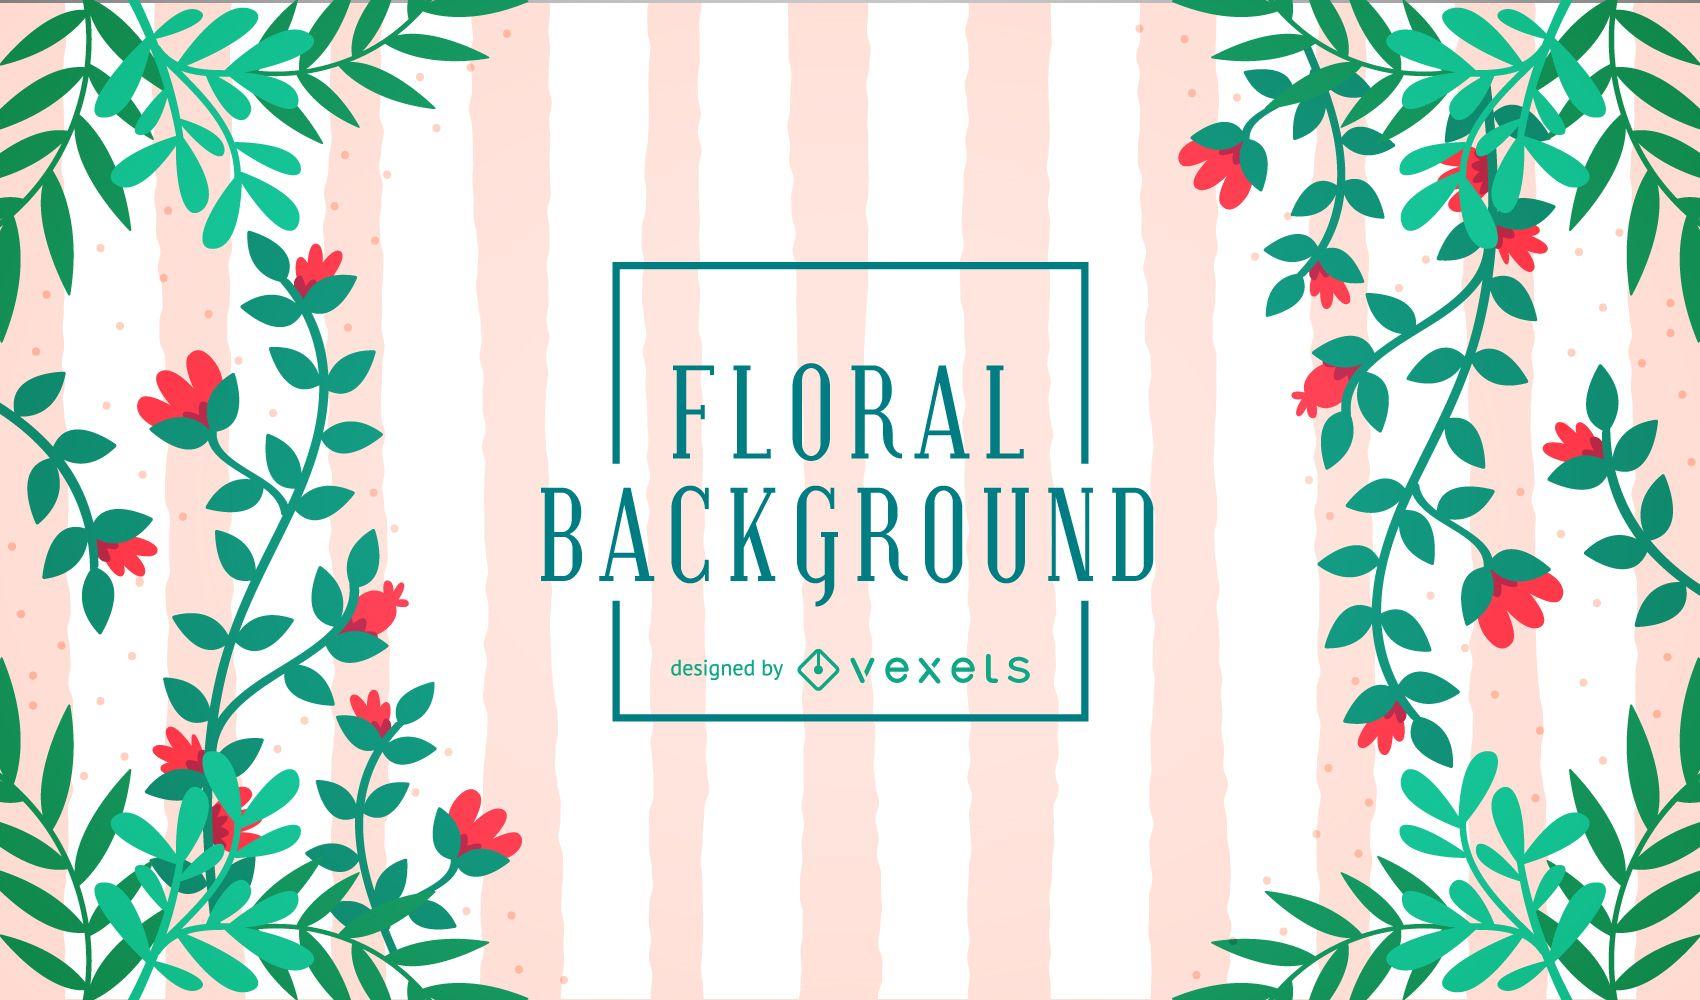 Lindo fondo floral con rayas